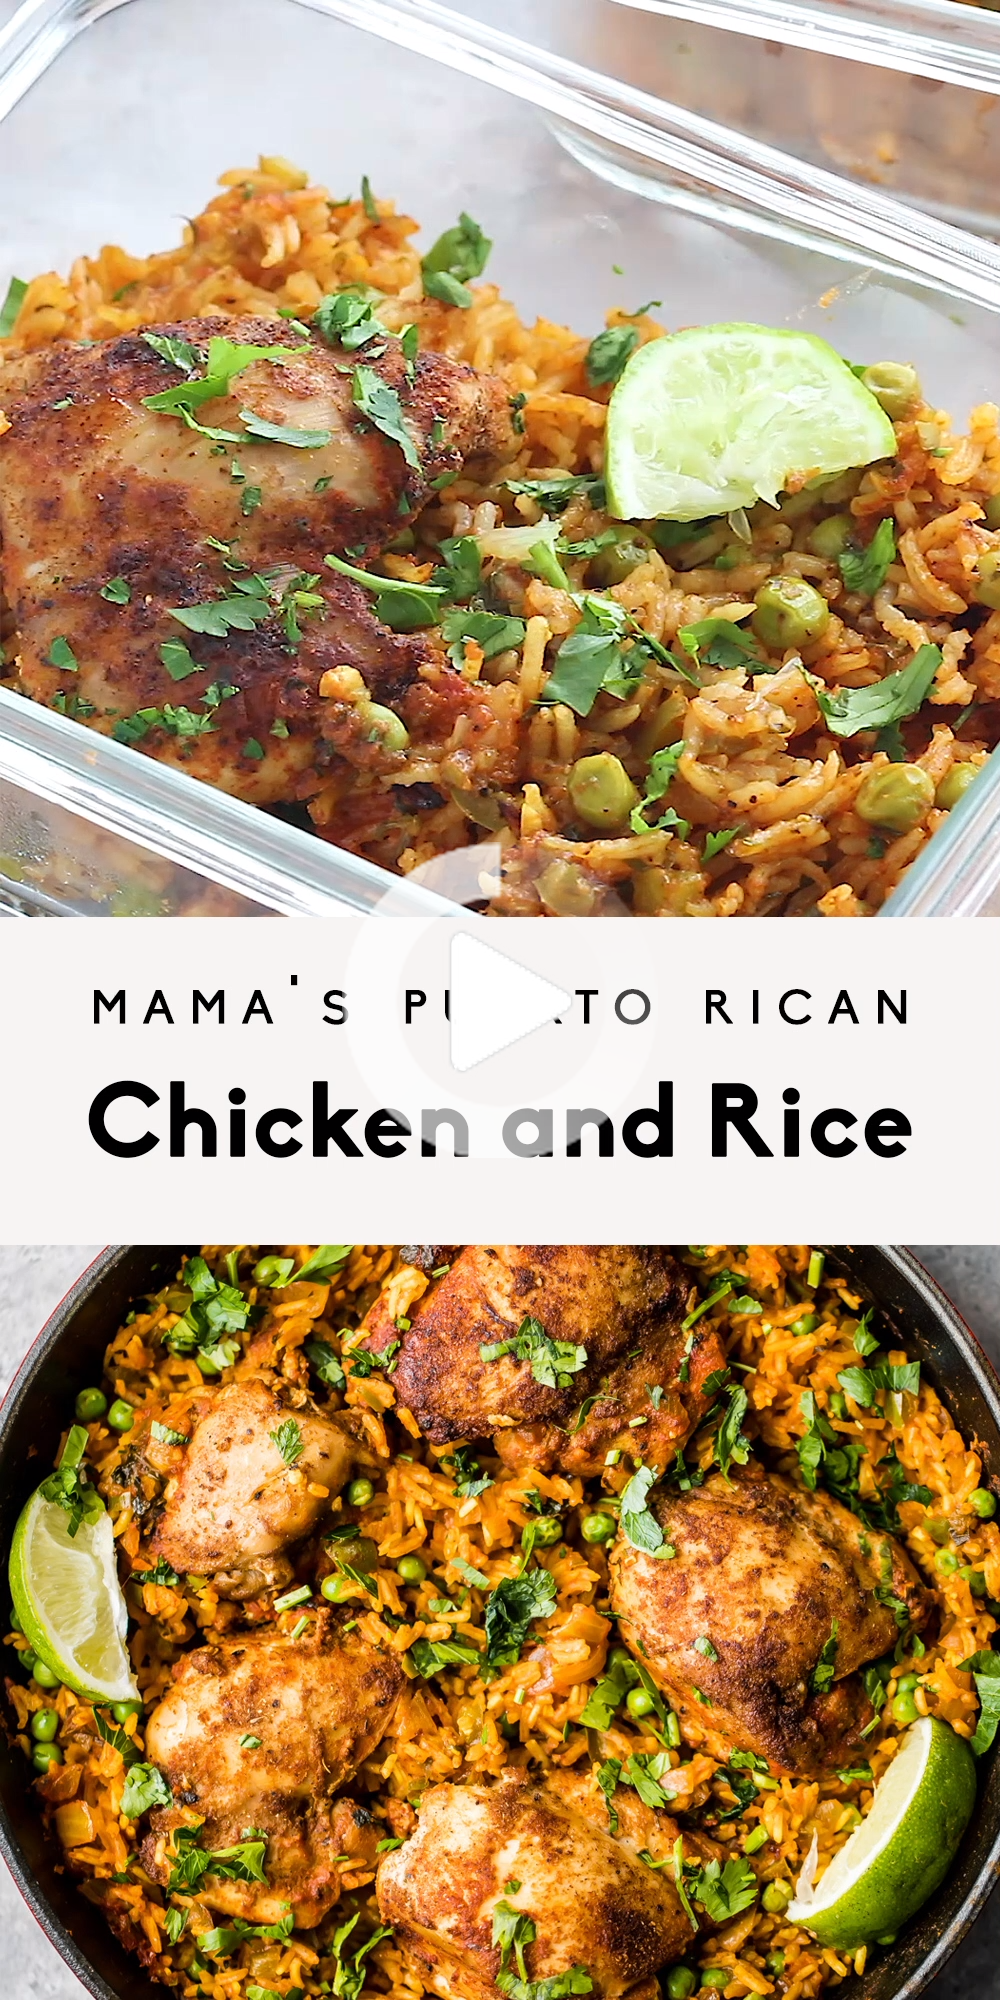 Mama Puerto Rico Chicken And Rice Znany Rowniez Jako Arroz Con Pollo Ten Pan Obiad Jest Wykonan In 2020 Healthy Chicken Recipes Chicken Dinner Recipes Kitchen Recipes